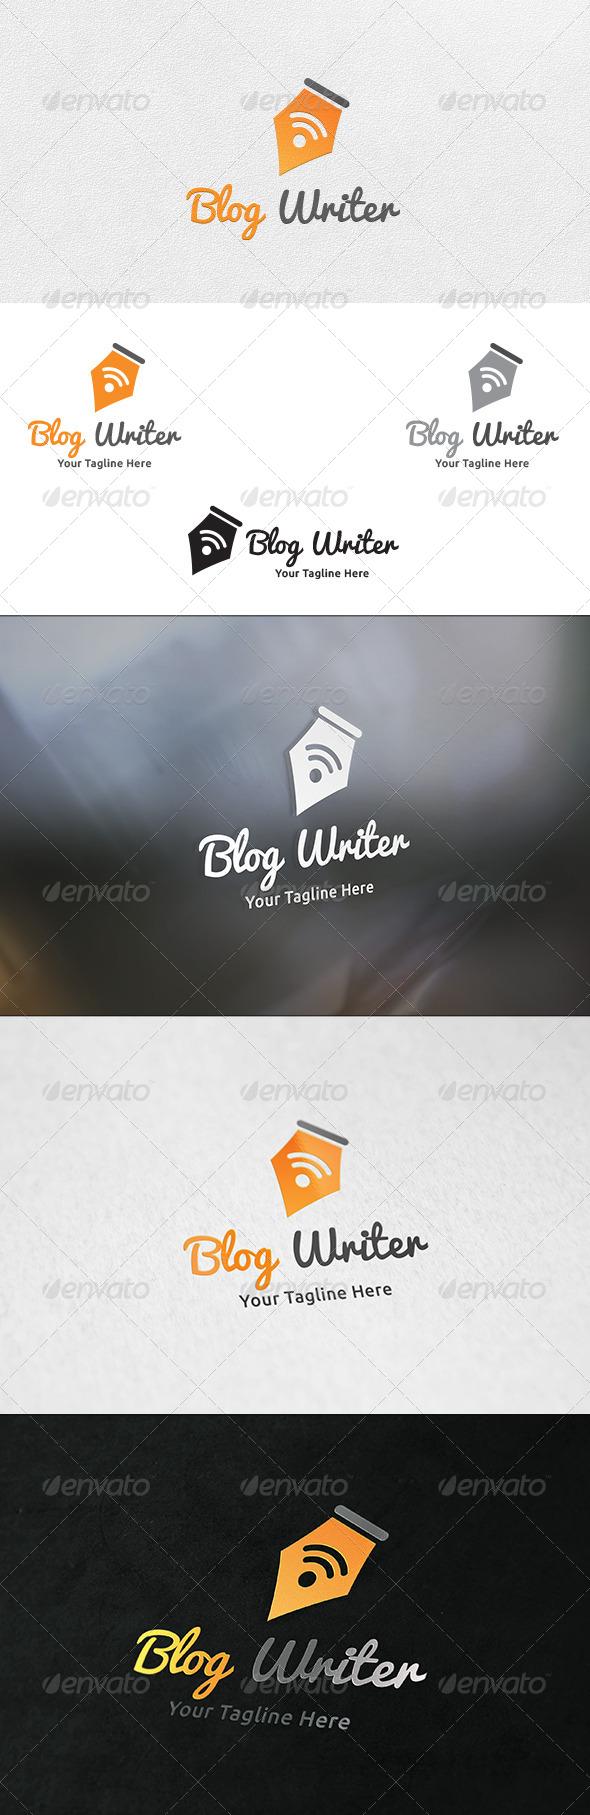 Blog Writer - Logo Template  - Symbols Logo Templates